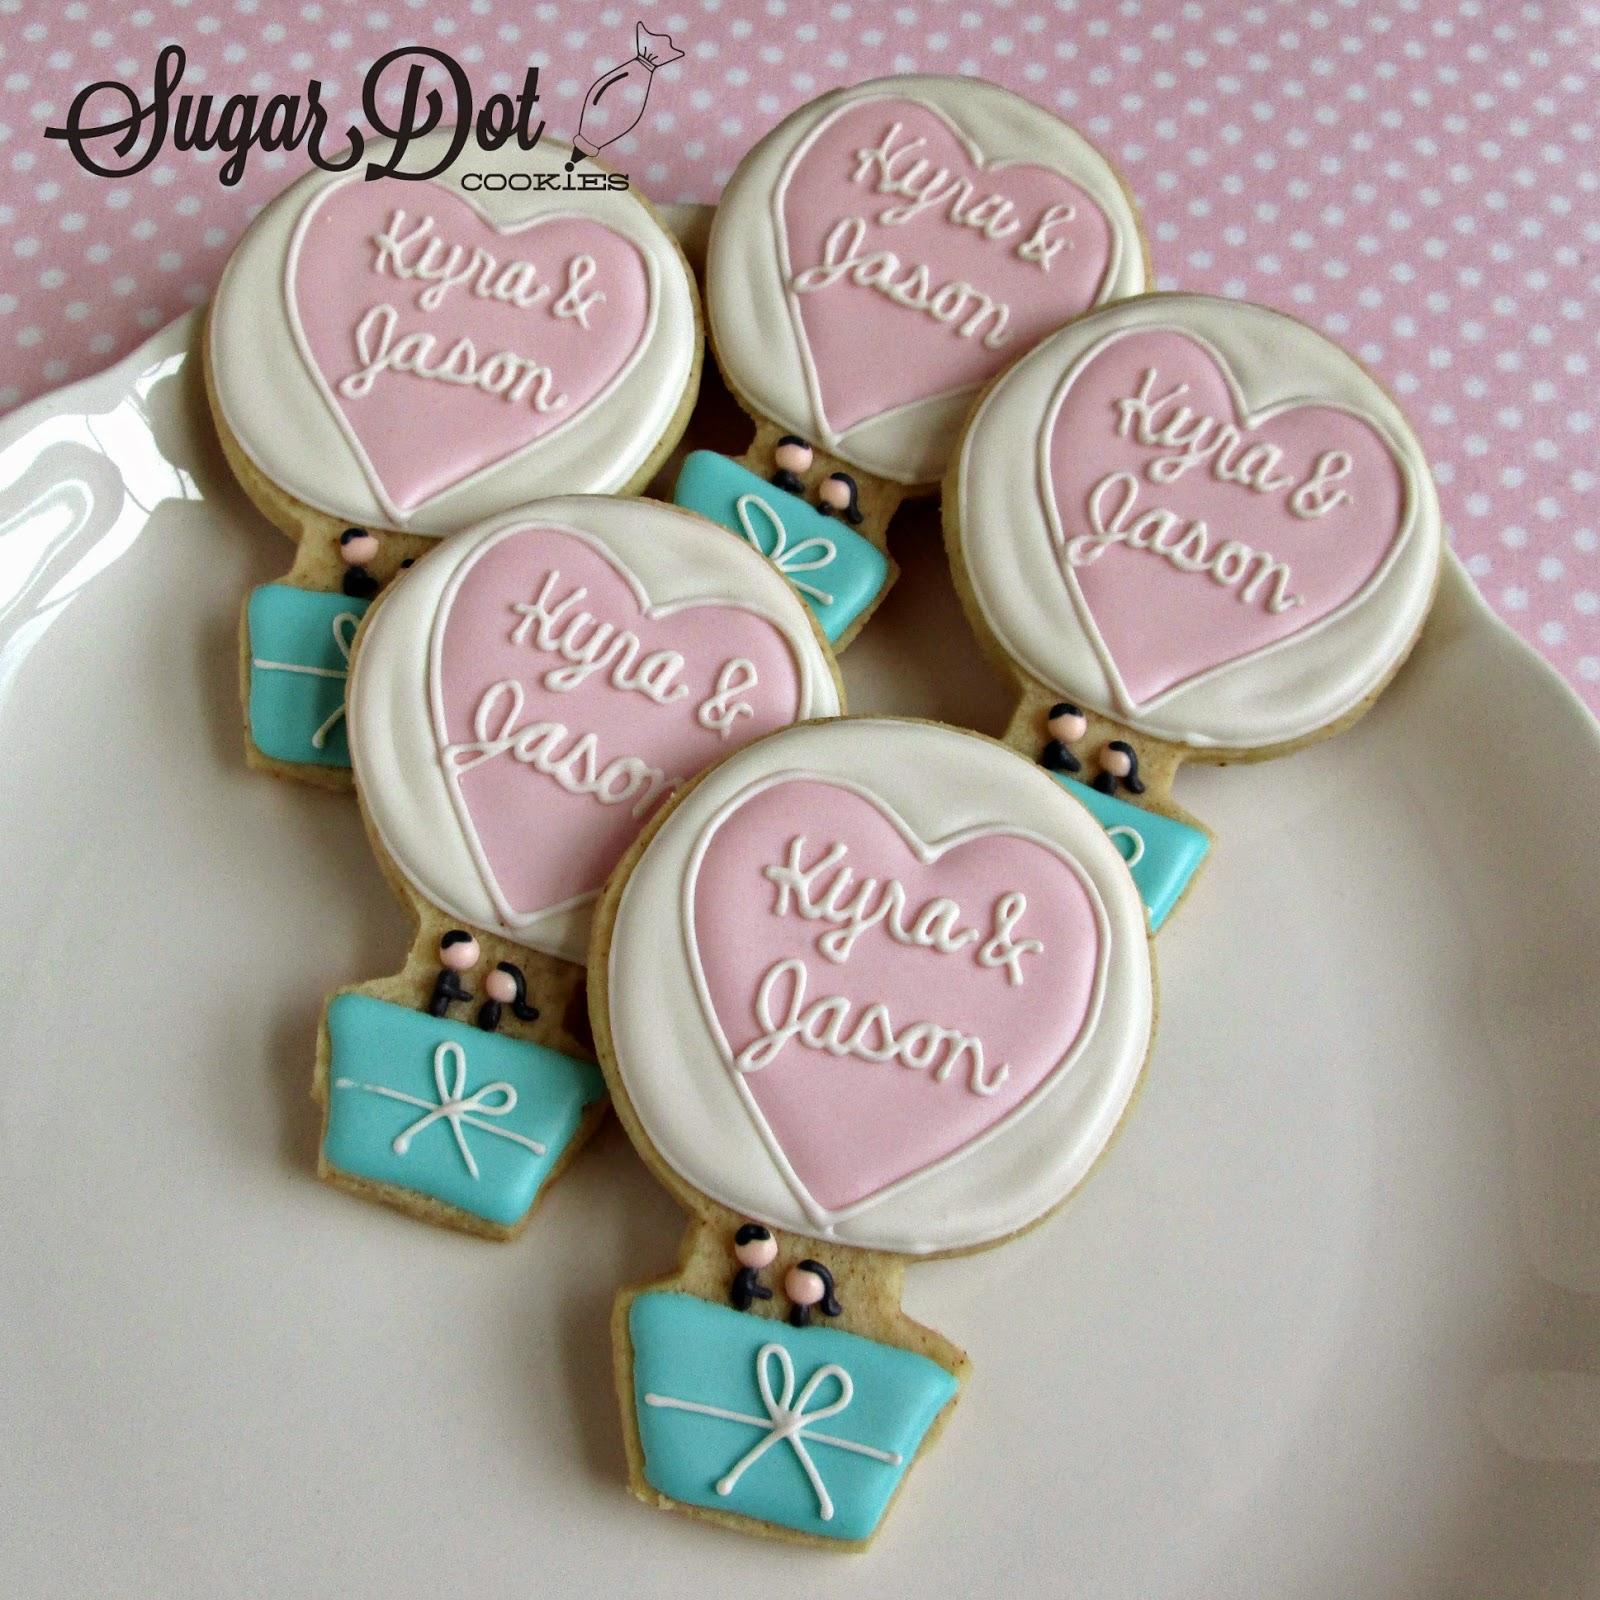 Sugar Dot Cookies July 2014